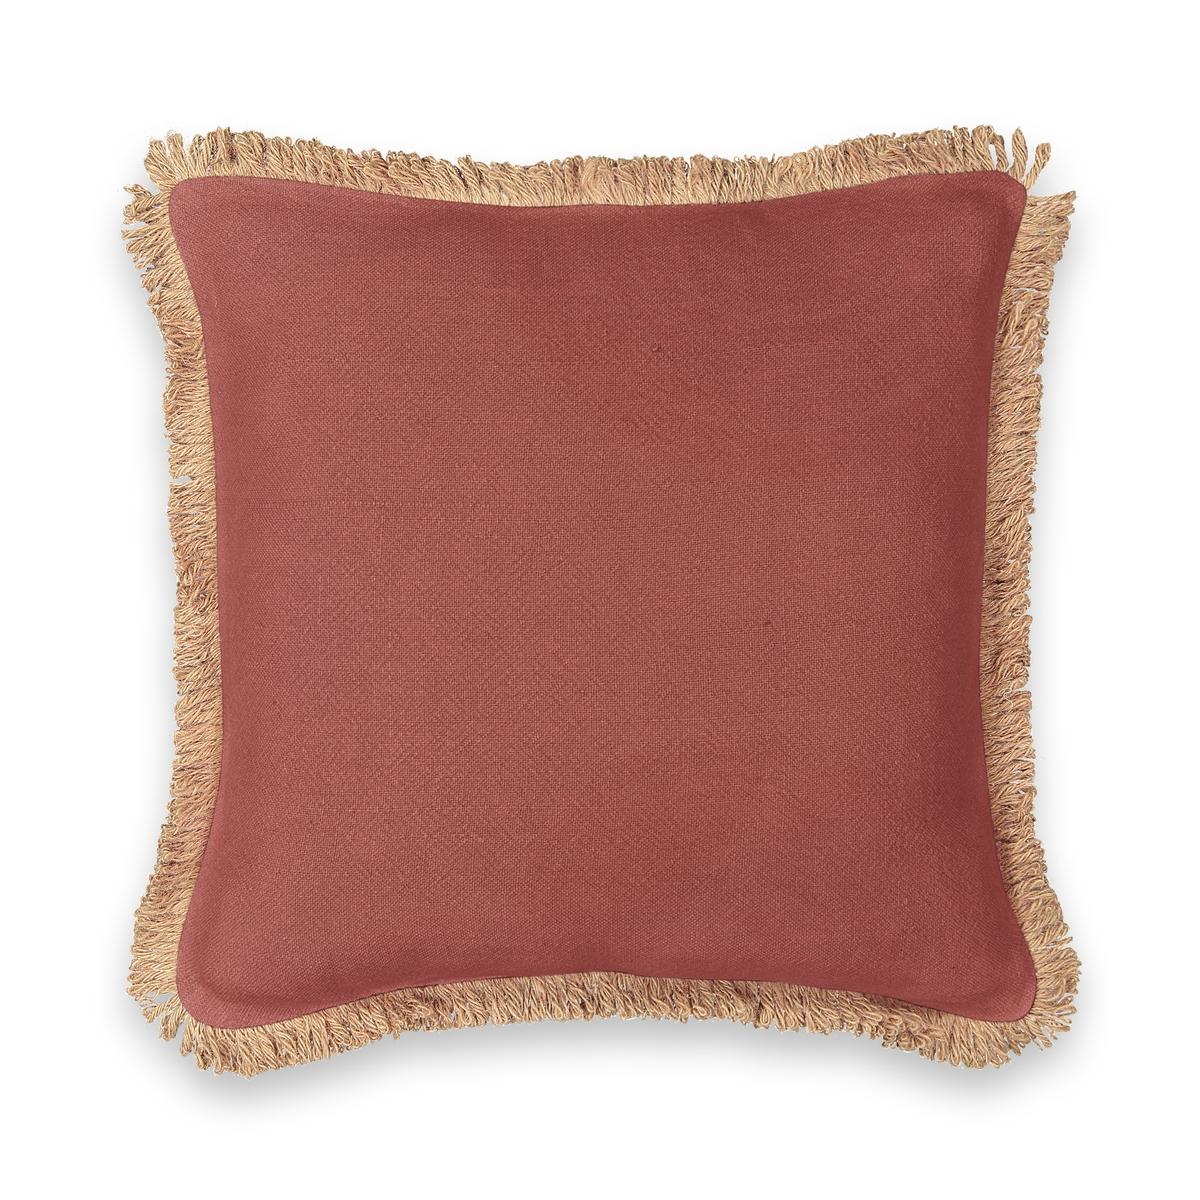 Чехол LaRedoute На подушку из джута Jutty 50 x 30 см красный